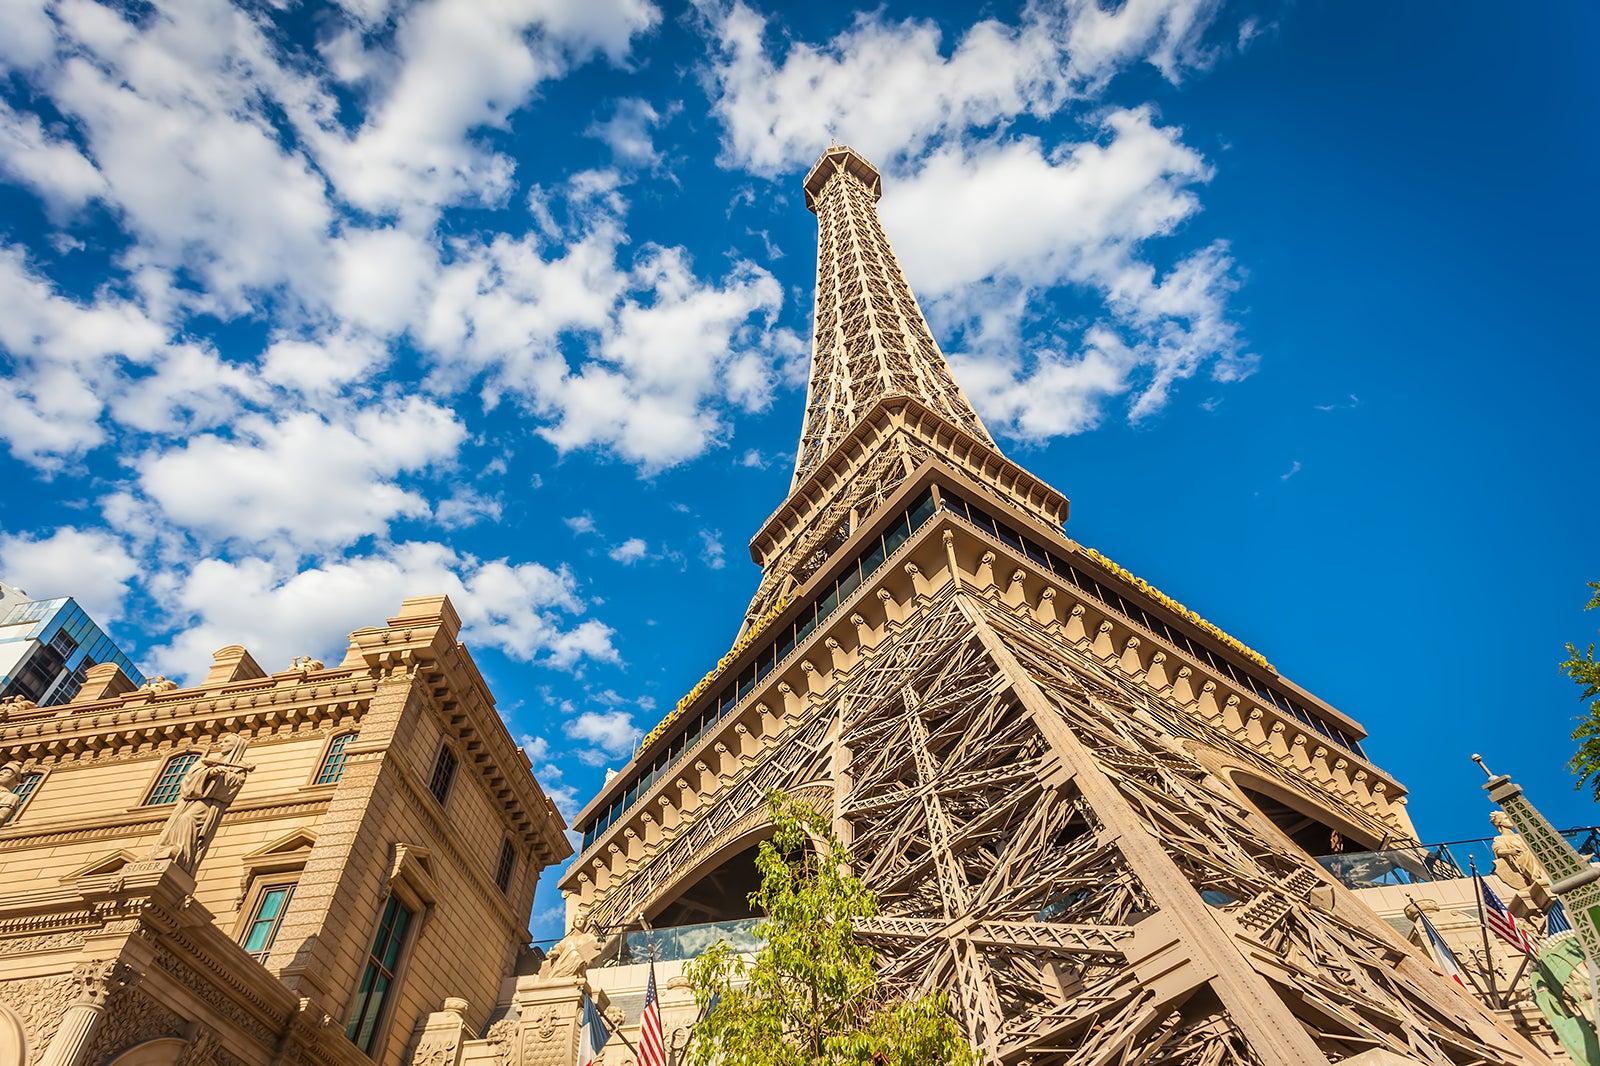 11 Lugares De Las Vegas Para Lucirte En Instagram Fotos De Las Vegas Para Dar Envidia A Tus Amigos Go Guides